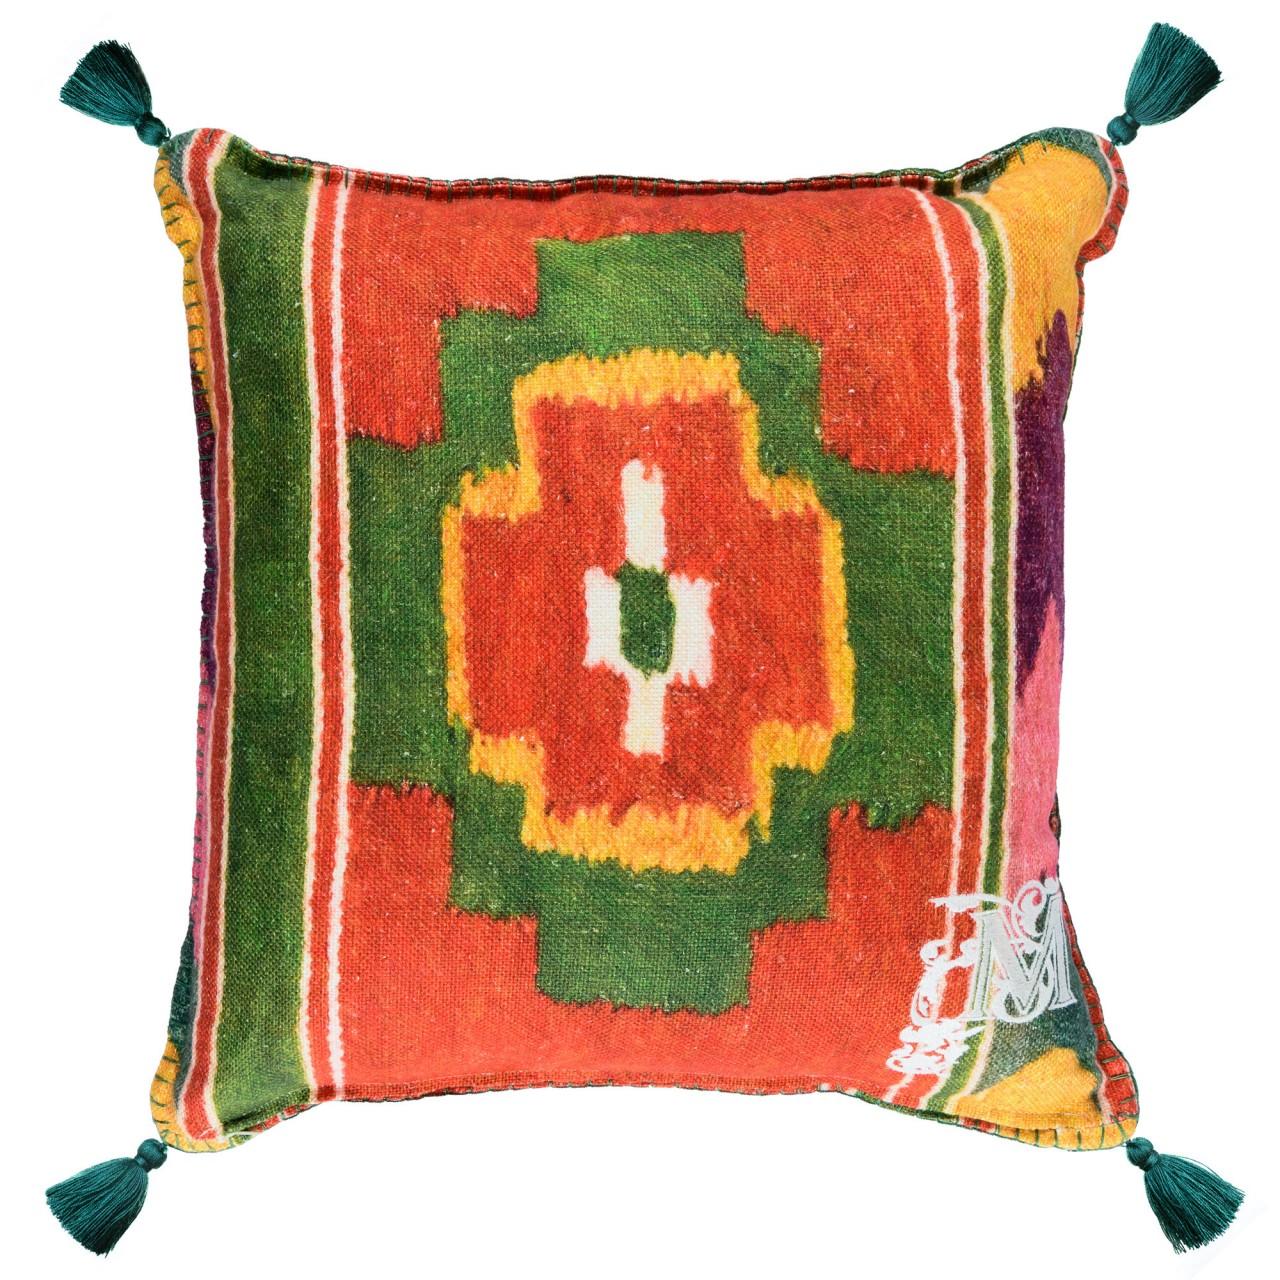 ERDELY Linen Cushion